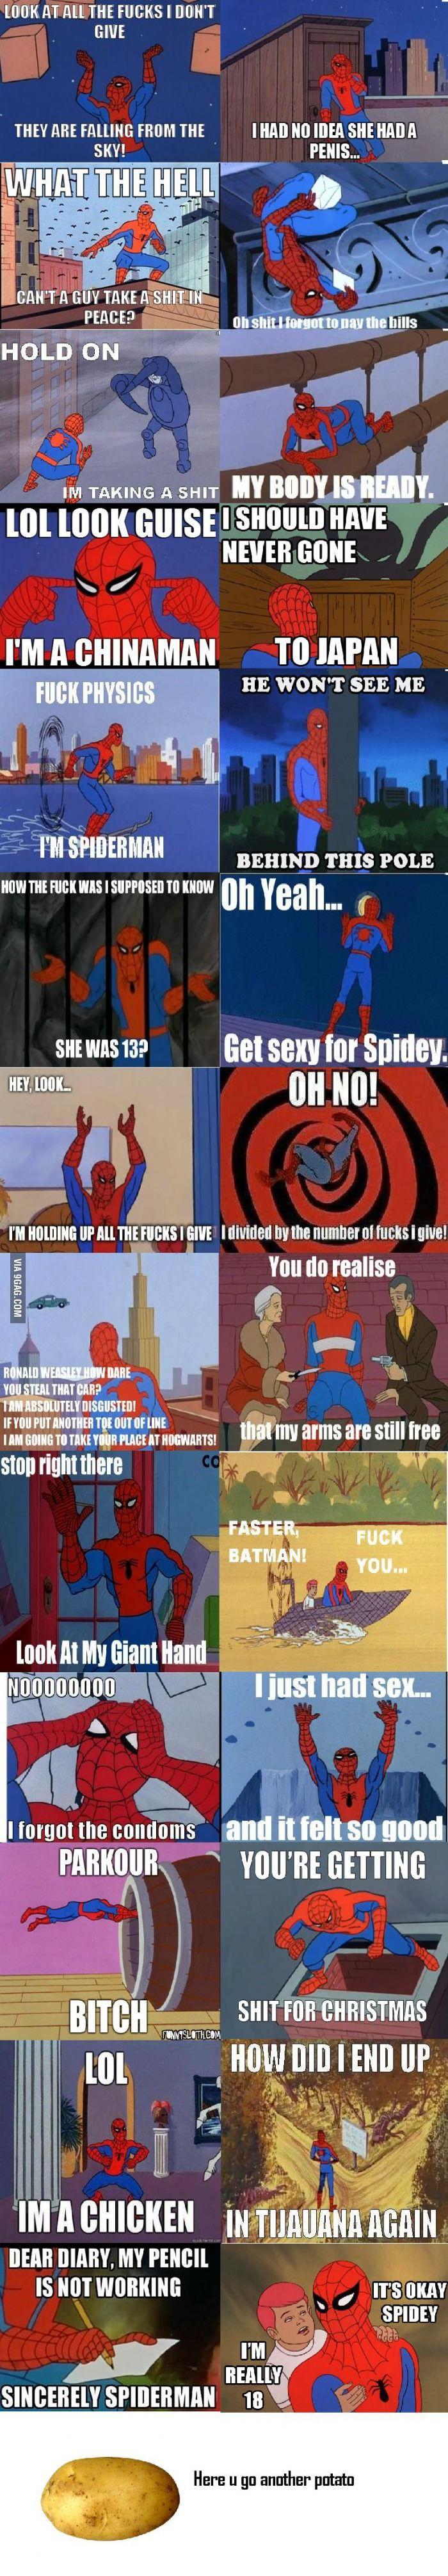 Let's bring back spiderman joke - 9GAG